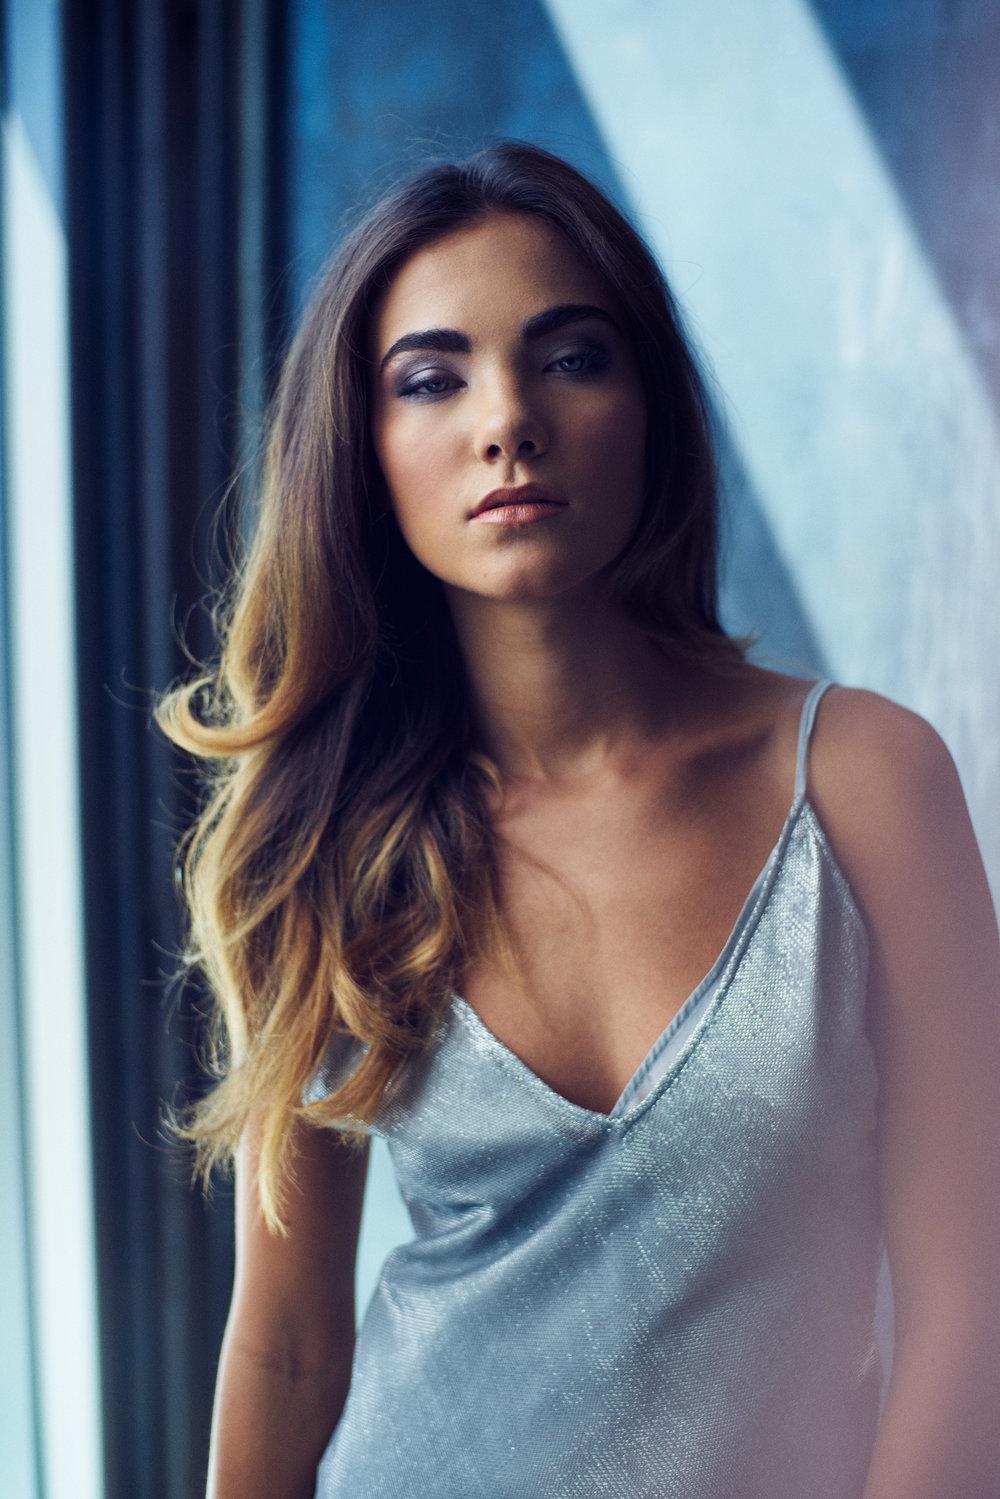 Peyton Toledo, Design De Amore, Caleb Alvarado, Melody Sanchez, Laura Flagler HMU, Fashion Photography, Beauty Photography, Glam